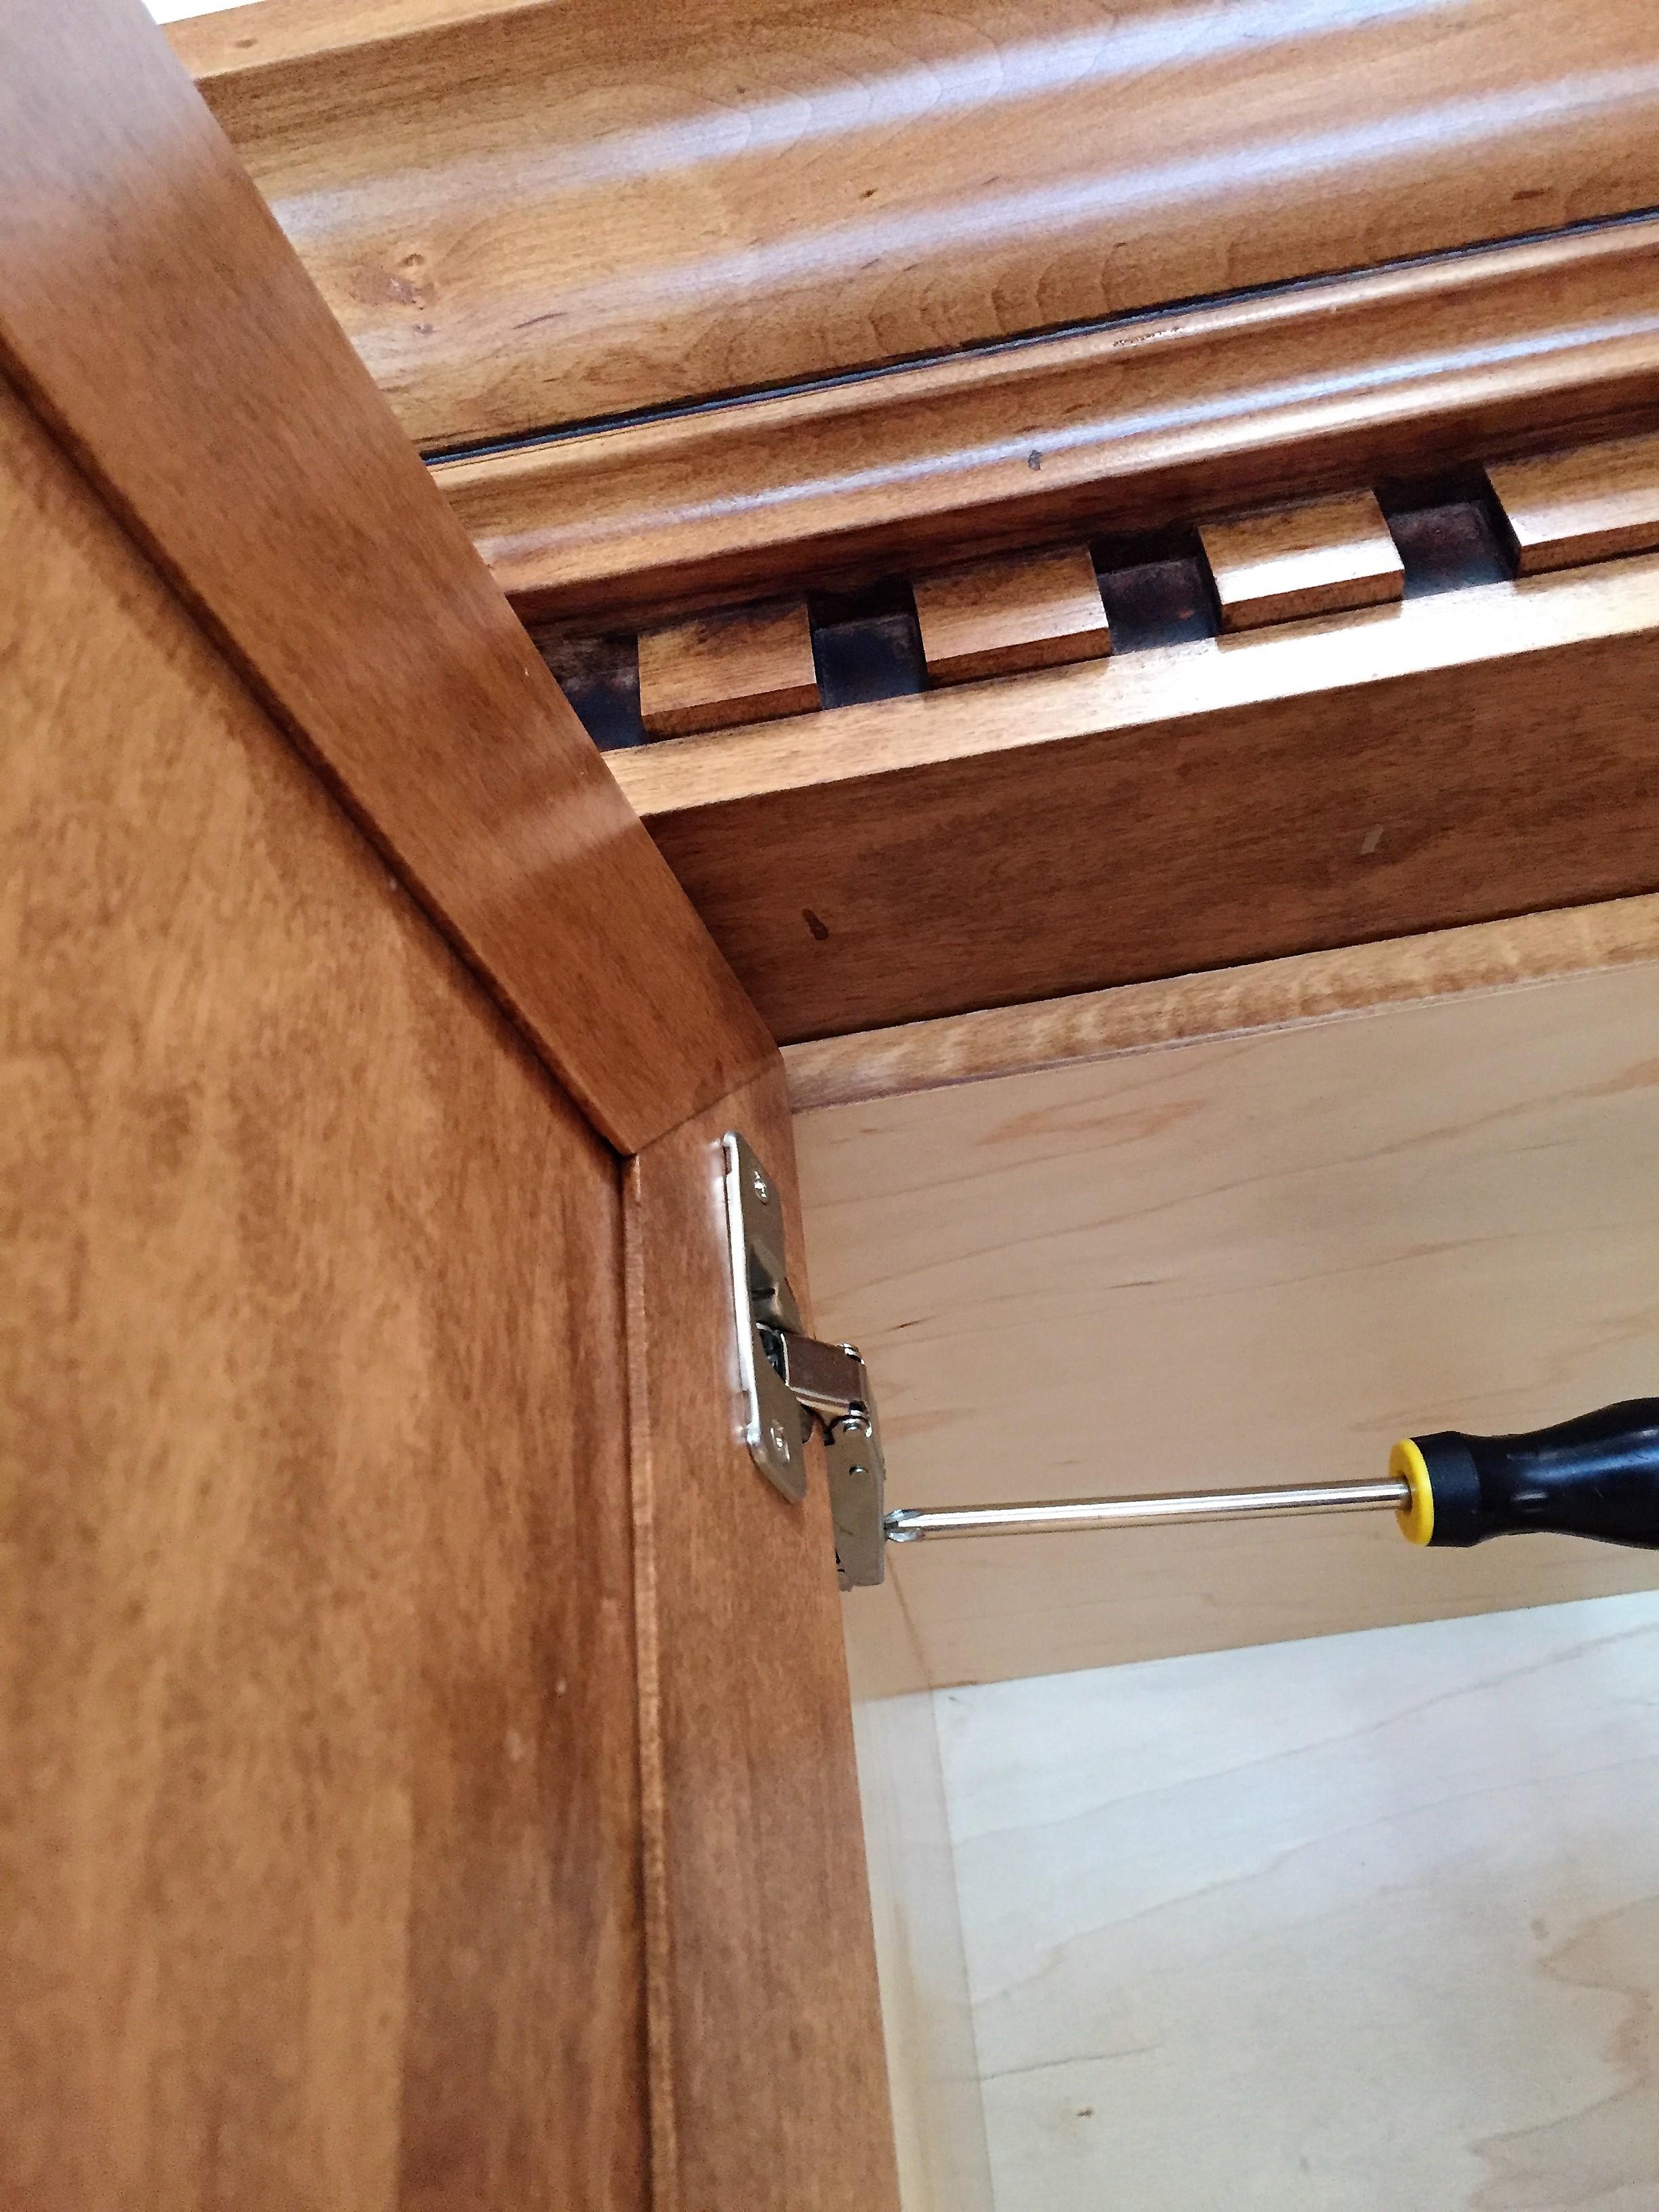 Cabinet Installation Of Cabinet Installers Orlando Deland Daytona Beach Fl